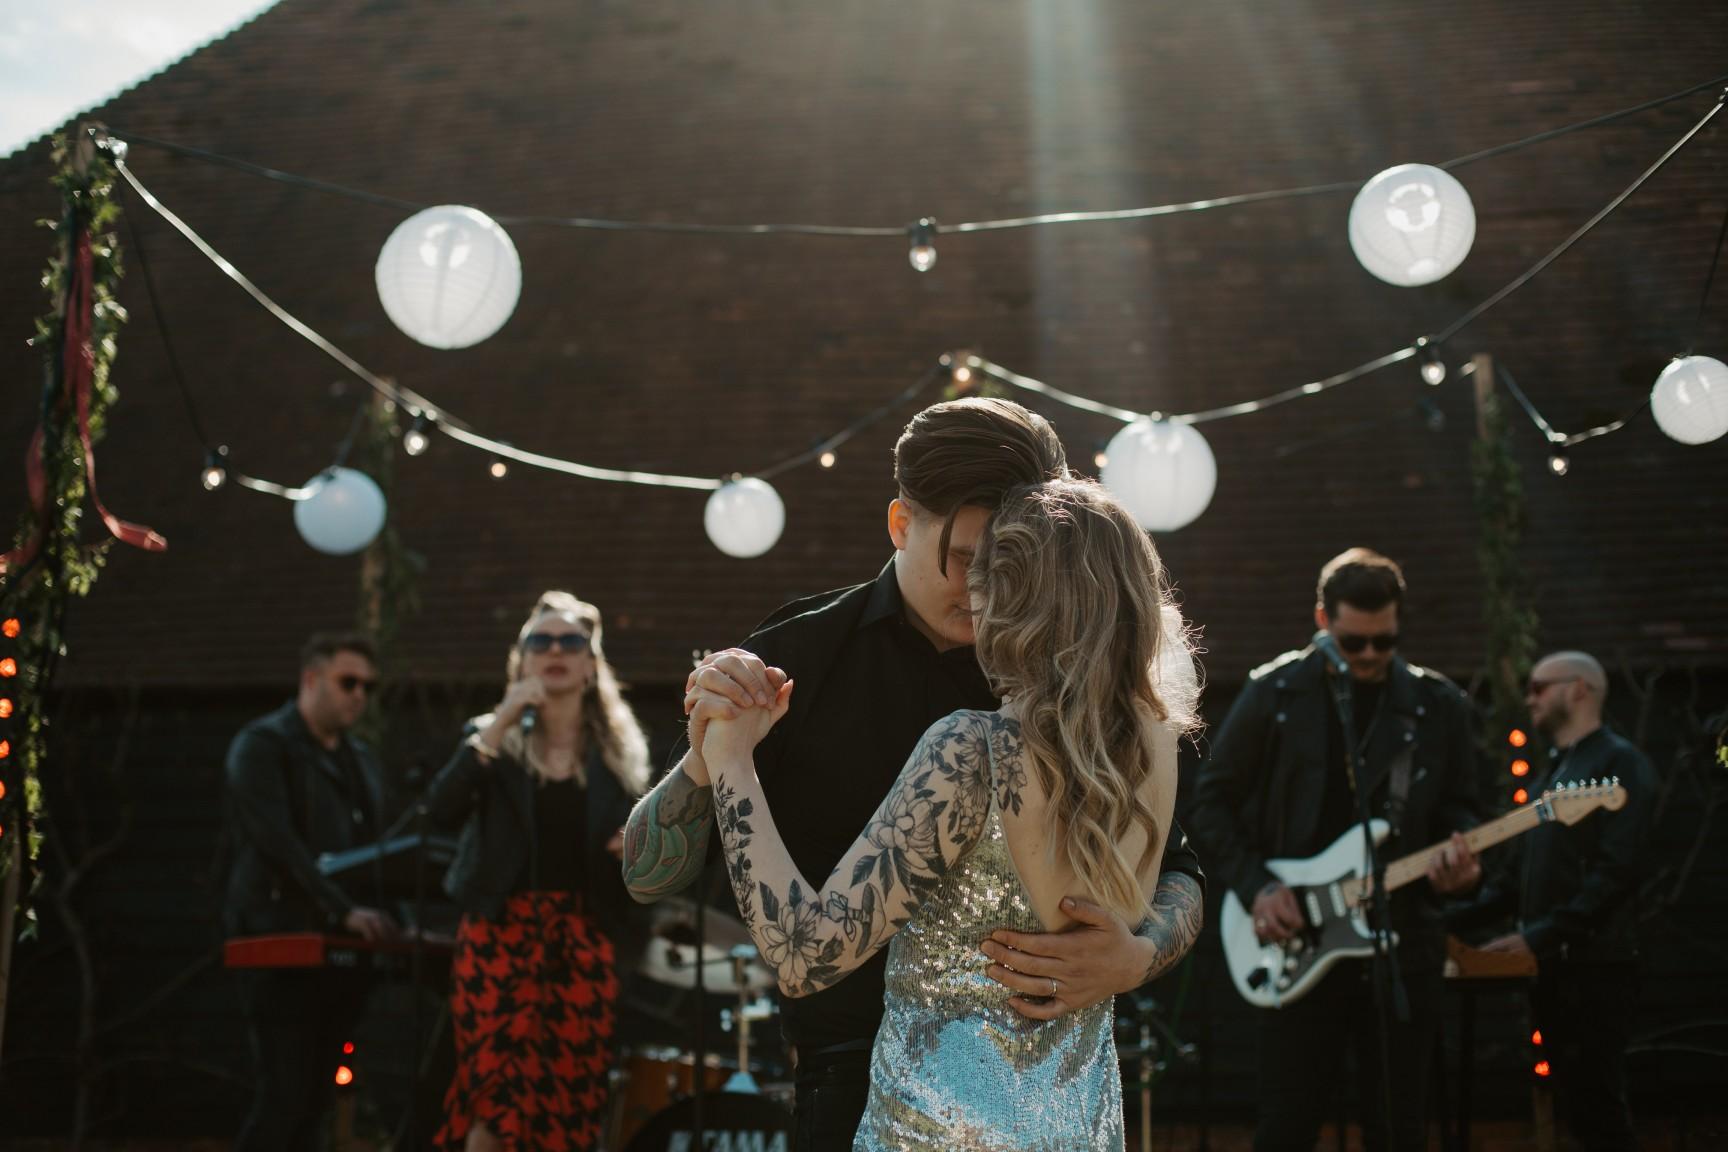 rock and roll wedding - edgy wedding inspiration - fnkhaus wedding band - wedding rock band - outdoor wedding ideas